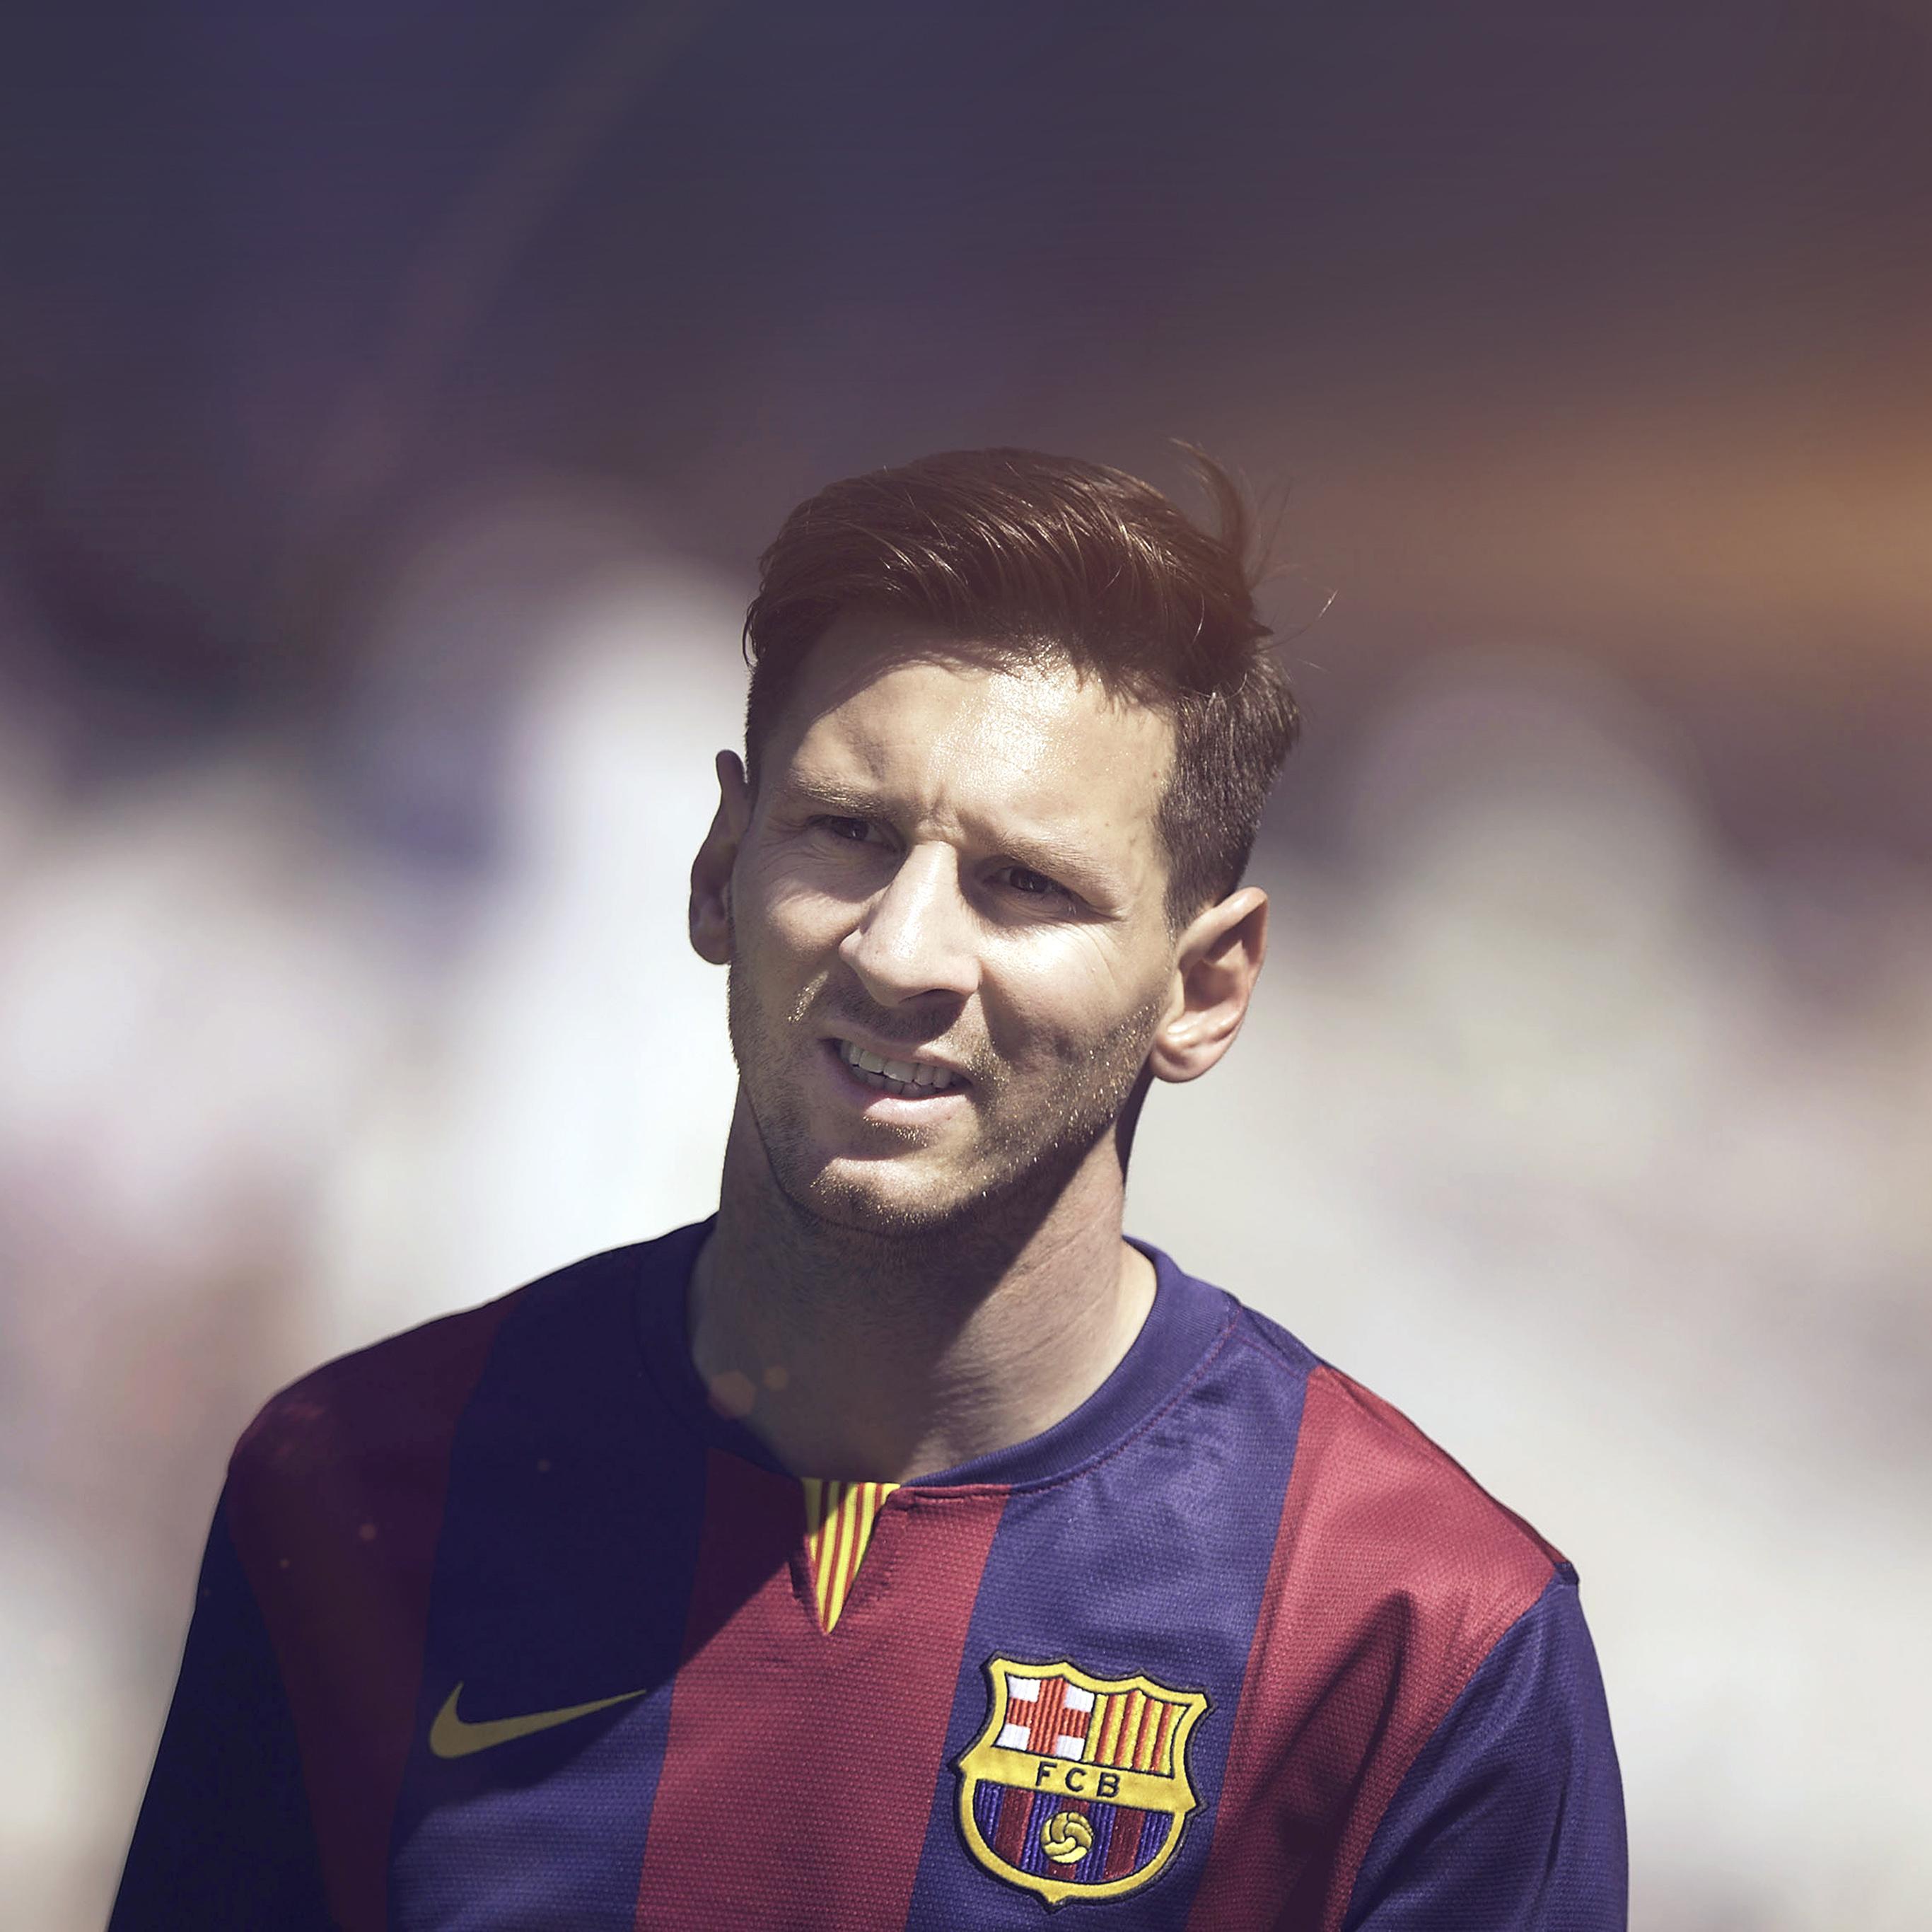 Hf60 Lionel Messi Barca Sports Soccer